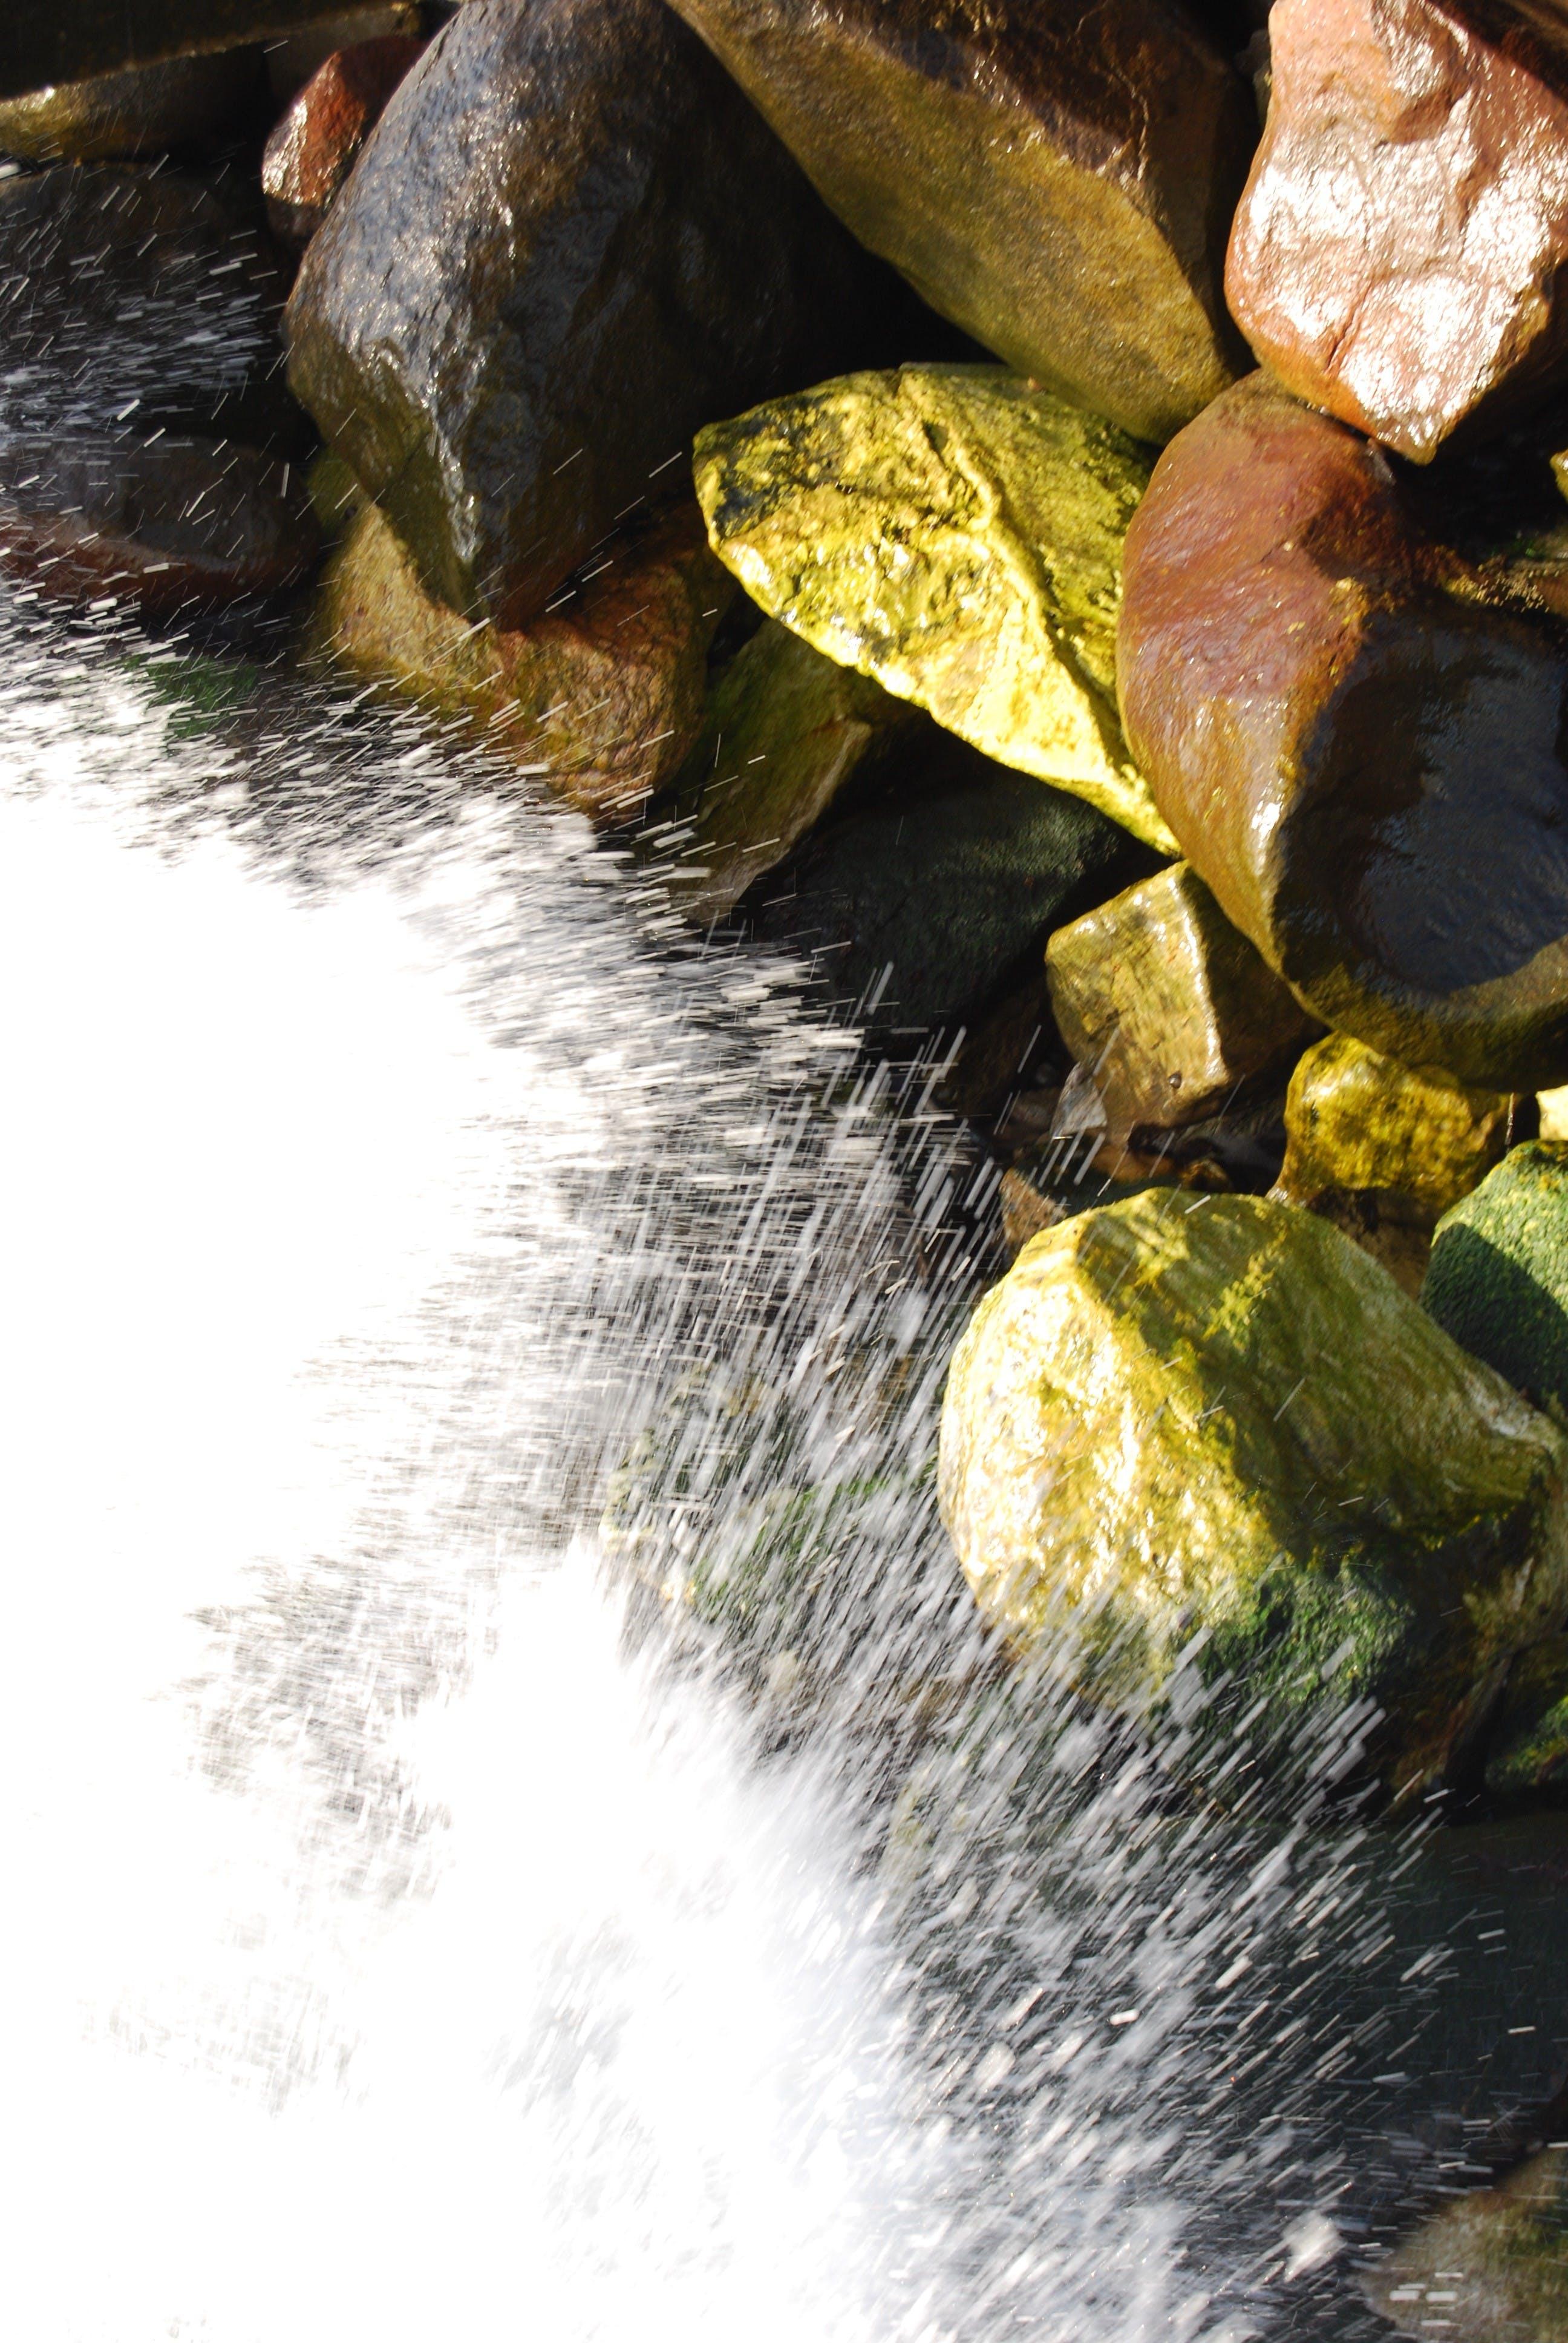 Free stock photo of Rocks Green Water Splash Nature Abstract